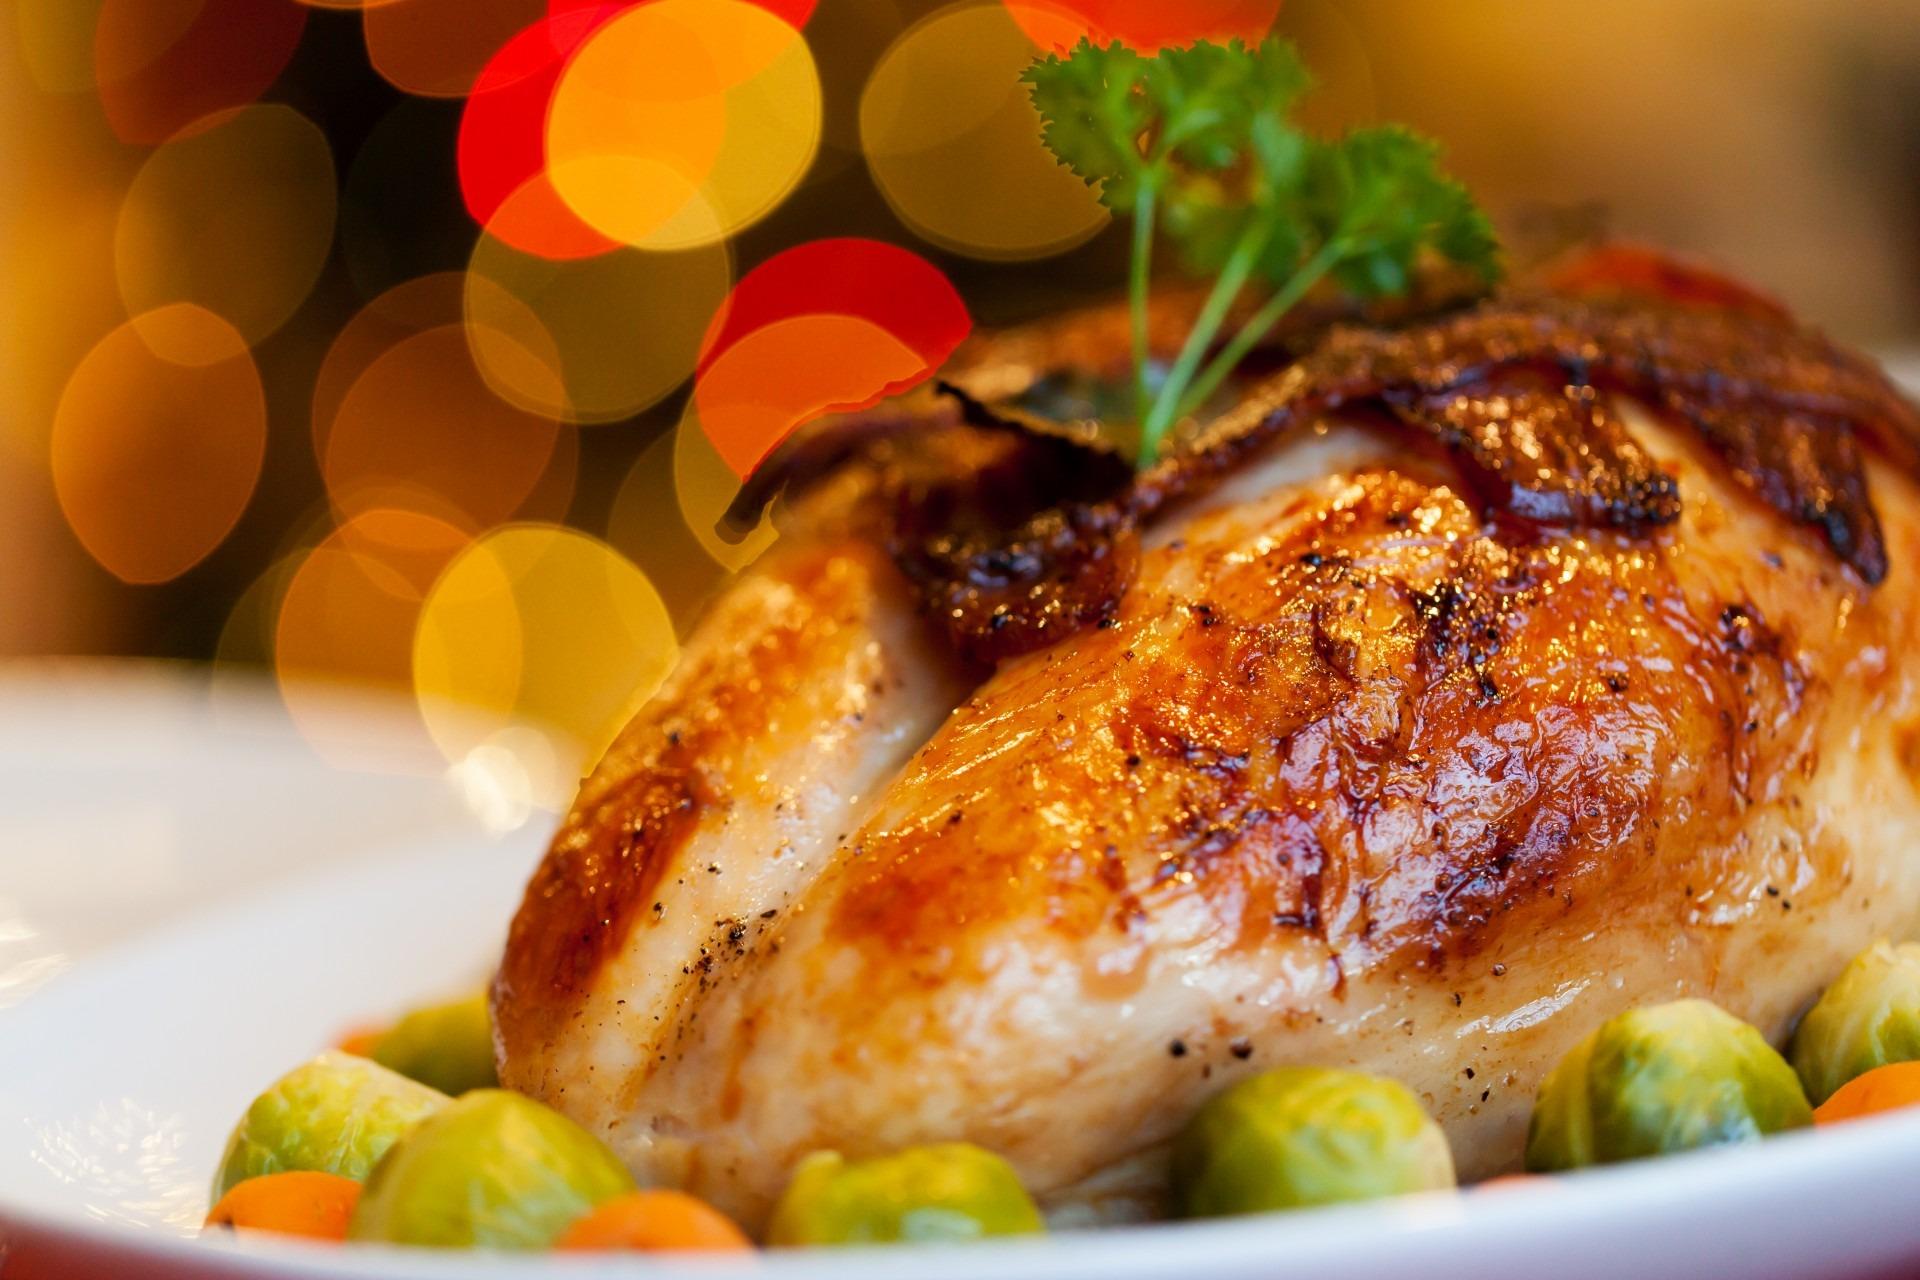 table-celebration-roast-dish-meal-food-978064-pxhere.com